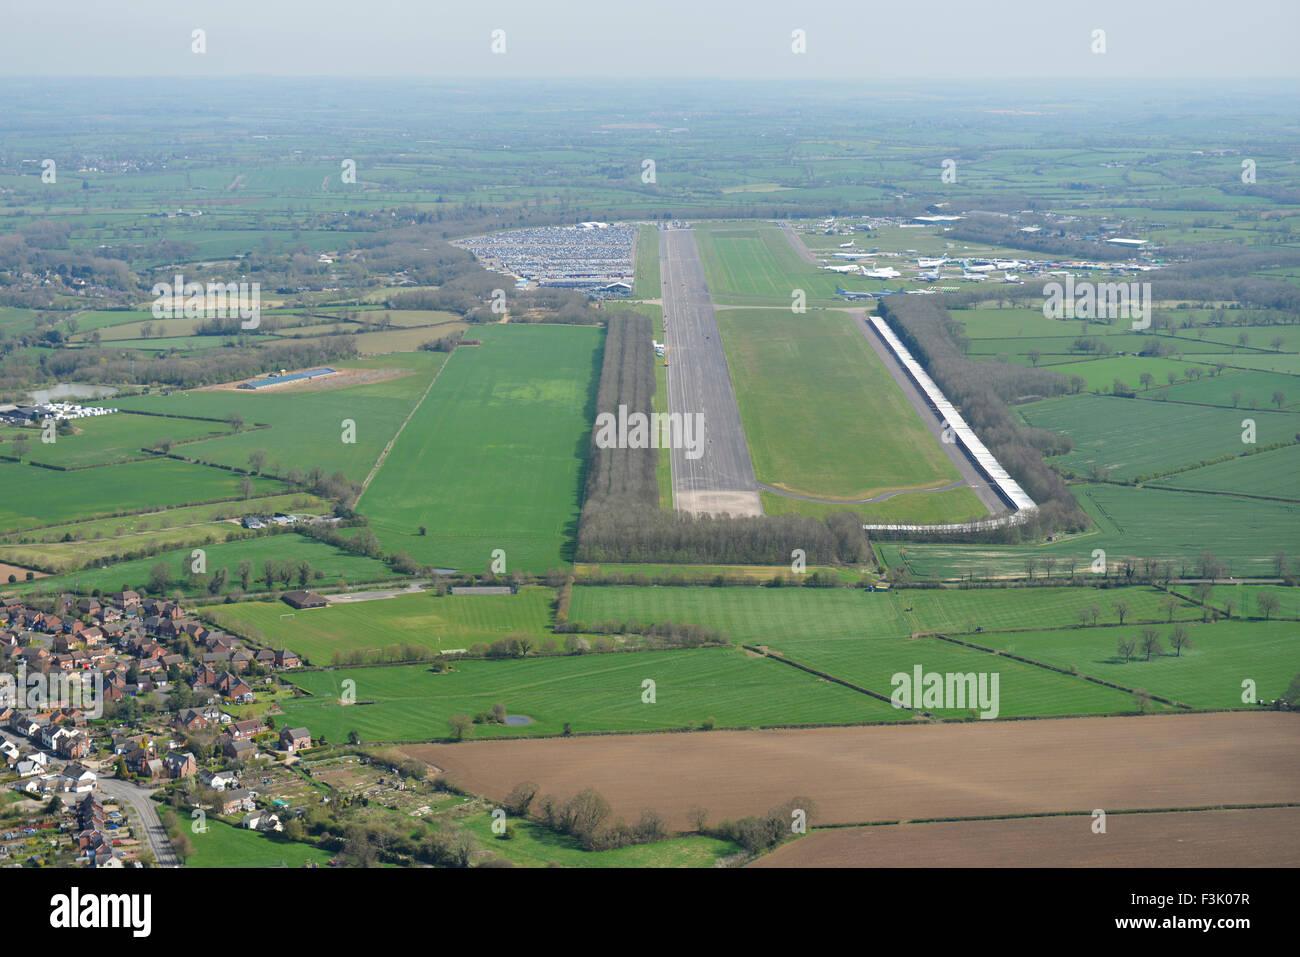 Aerial photograph of Bruntingthorpe Aerodrome and vehicle proving ground, Leicestershire - Stock Image